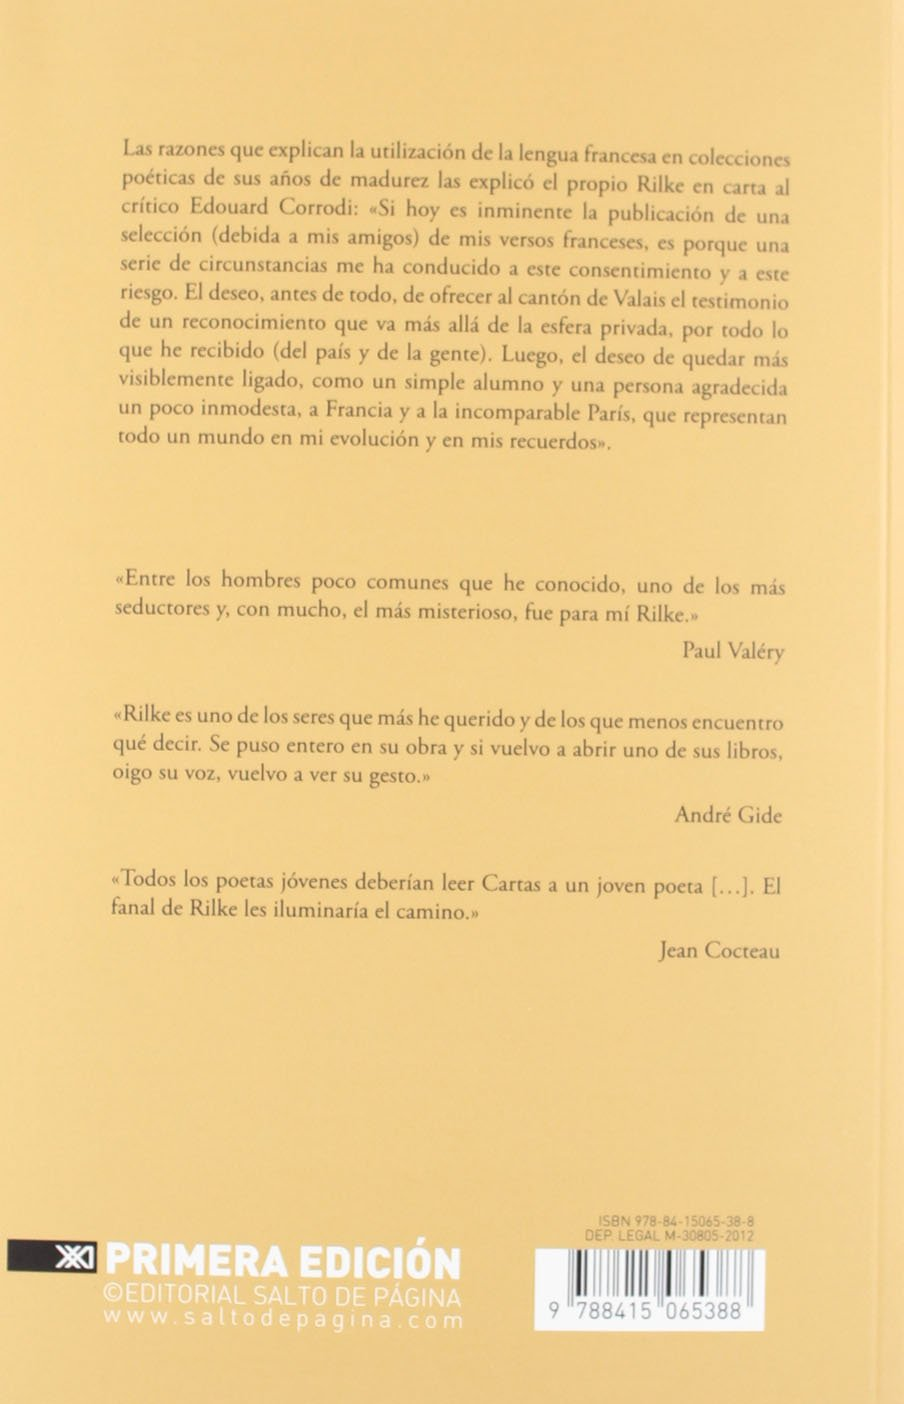 ROSAS. ESBOZOS VALAISANOS, LAS (Spanish Edition): Rainer ...